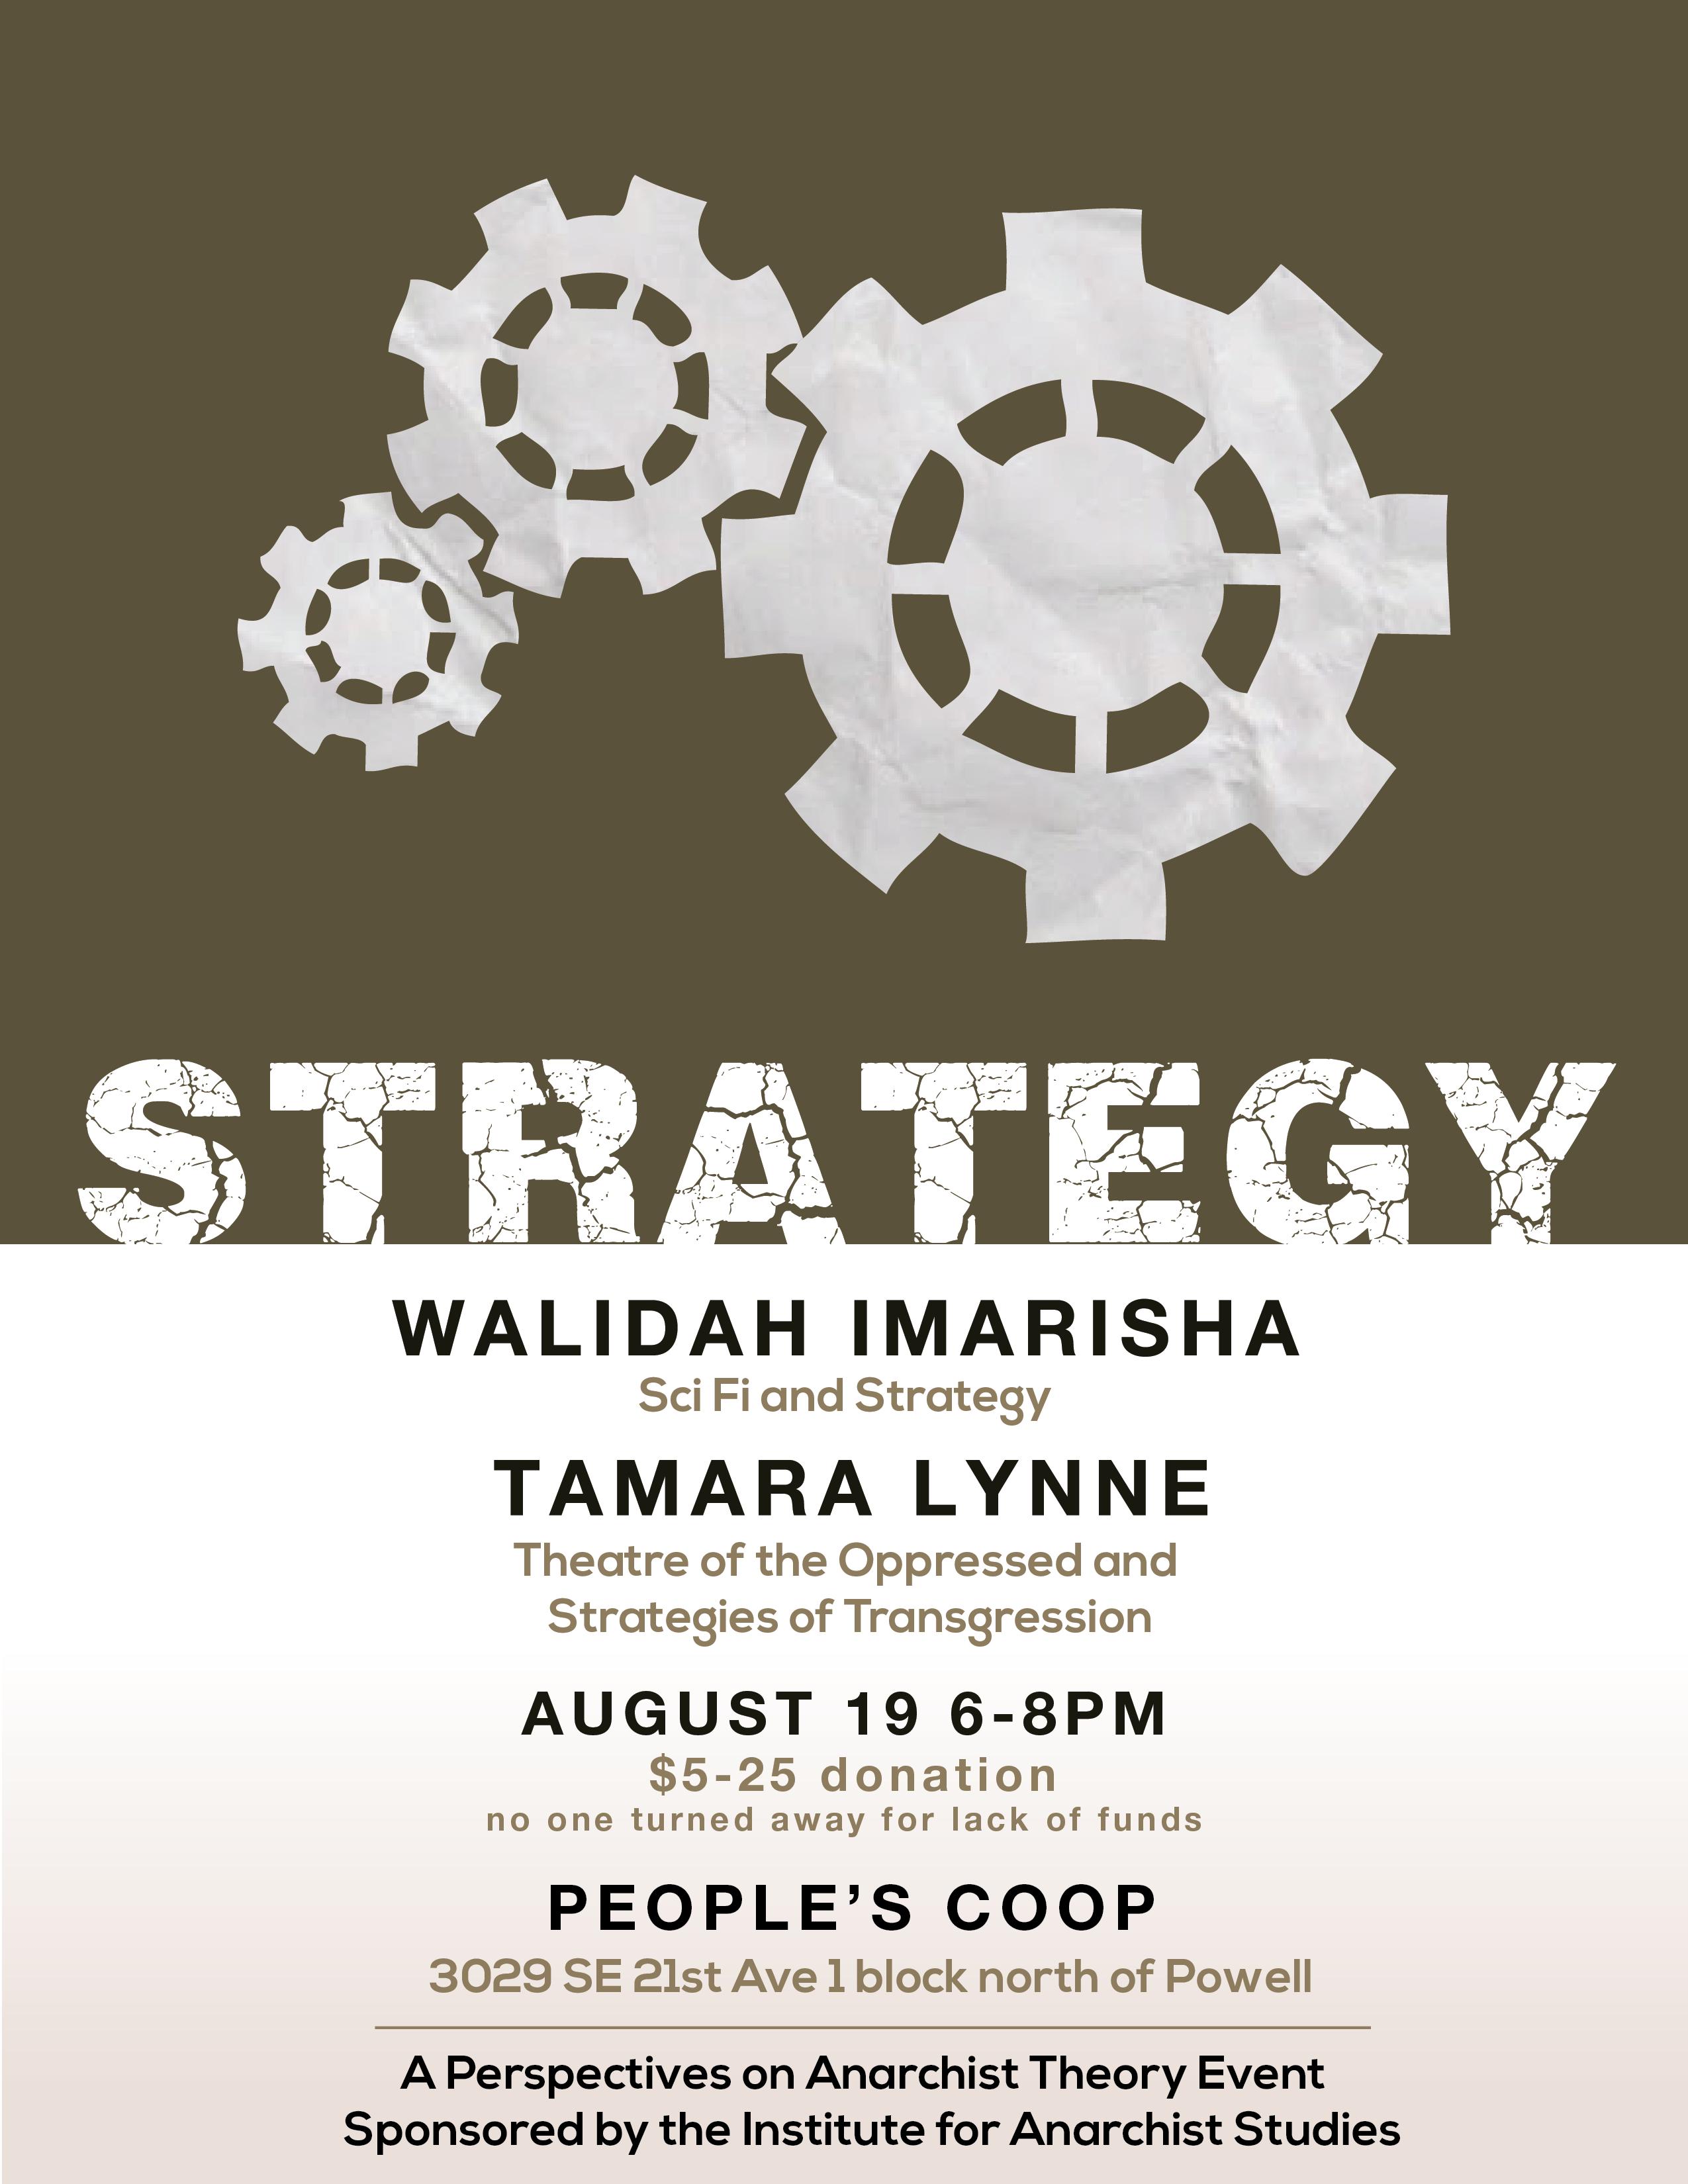 Kat Enyeart Poster for Speaker Event